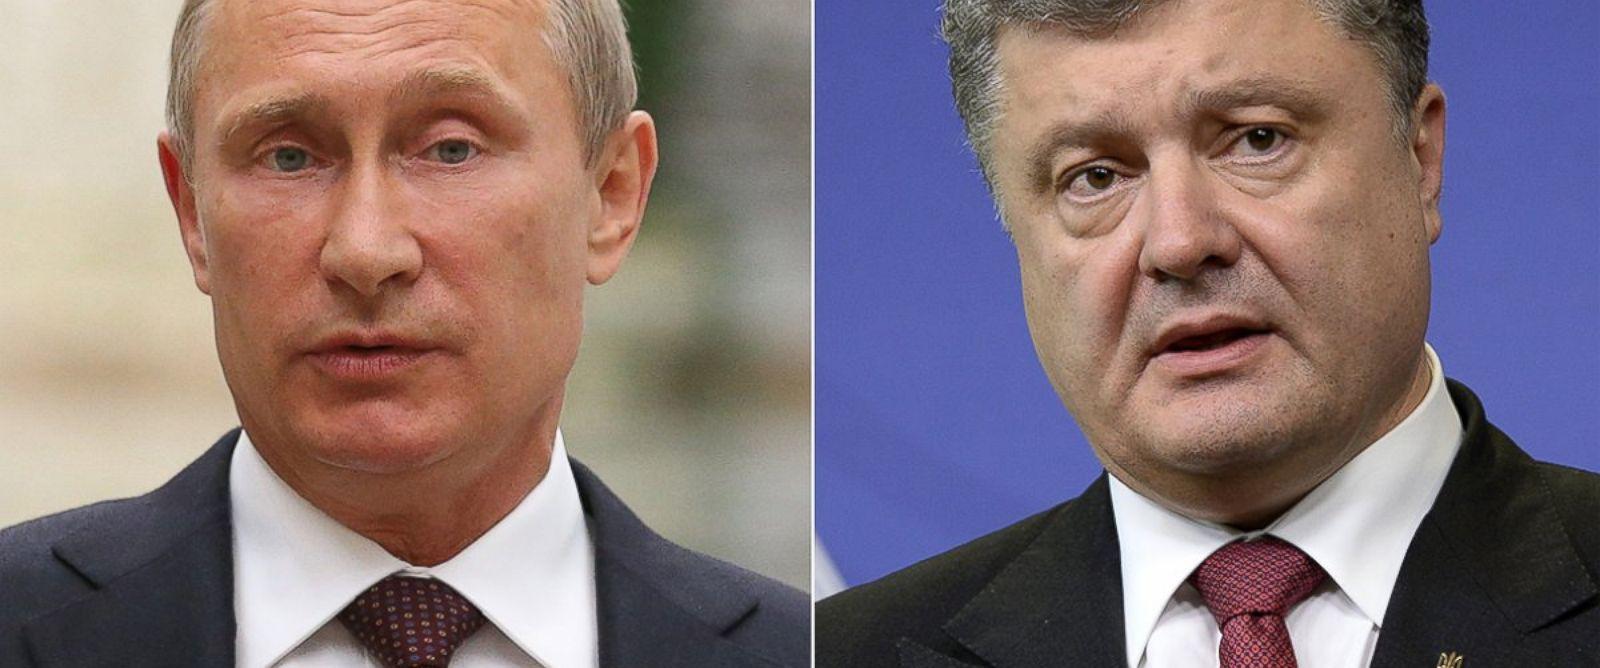 PHOTO: Russian President Vladimir Putin, left, is pictured on Aug. 26, 2014 in Minsk, Belarus. Ukrainian President Petro Poroshenko, right, is pictured on Aug. 30. 2014 in Brussels, Belgium.